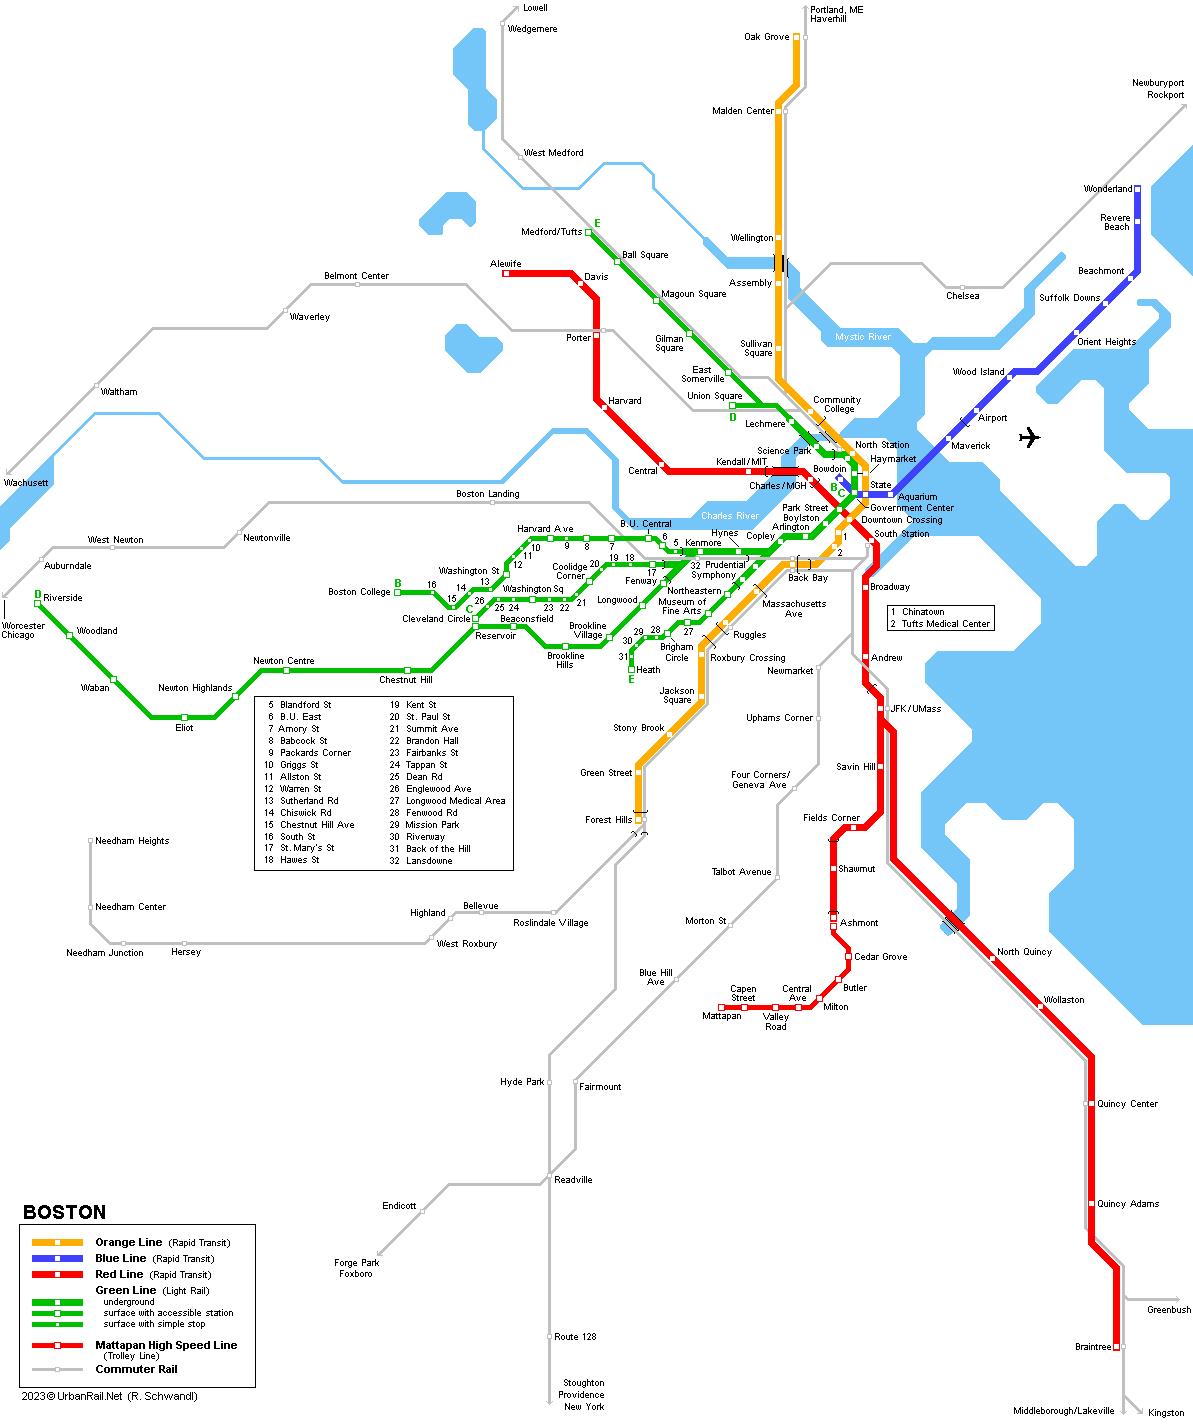 "Boston Transit Map UrbanRail.> North Amercia > USA > Massachussetts > Boston T  Boston Transit Map"" title=""Boston Transit Map UrbanRail.> North Amercia > USA > Massachussetts > Boston T  Boston Transit Map"" width=""200″ height=""200″> <img src="